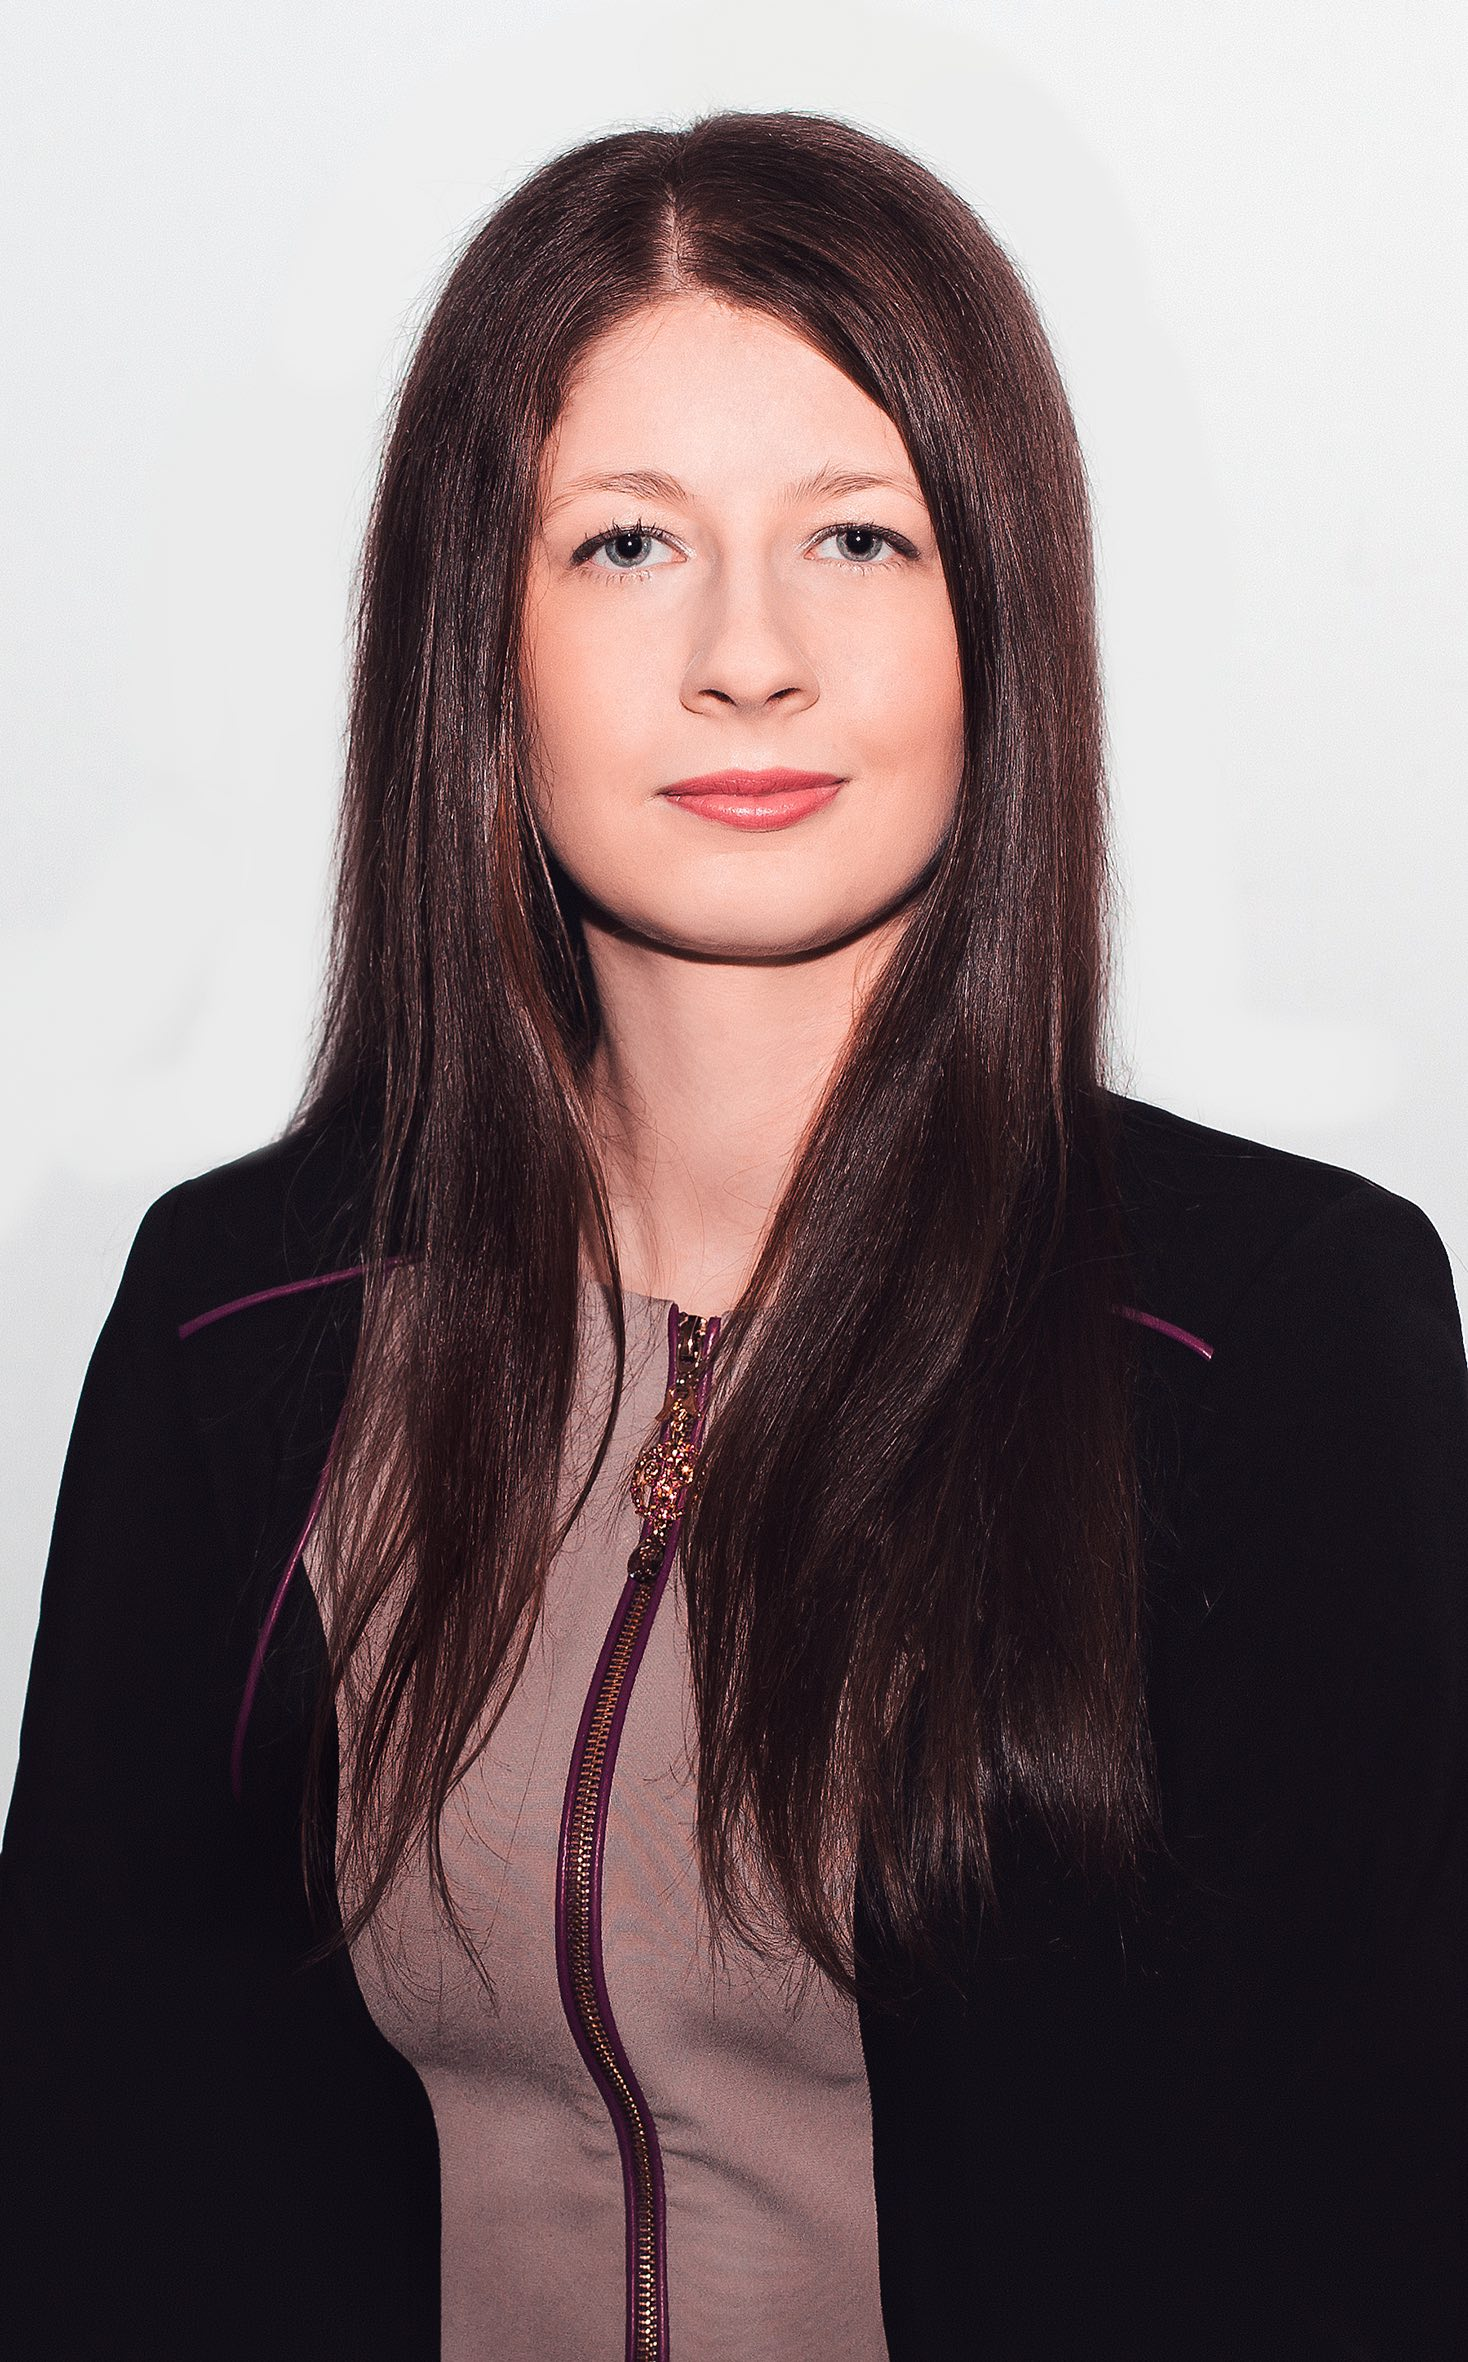 Худик Ольга Богданівна